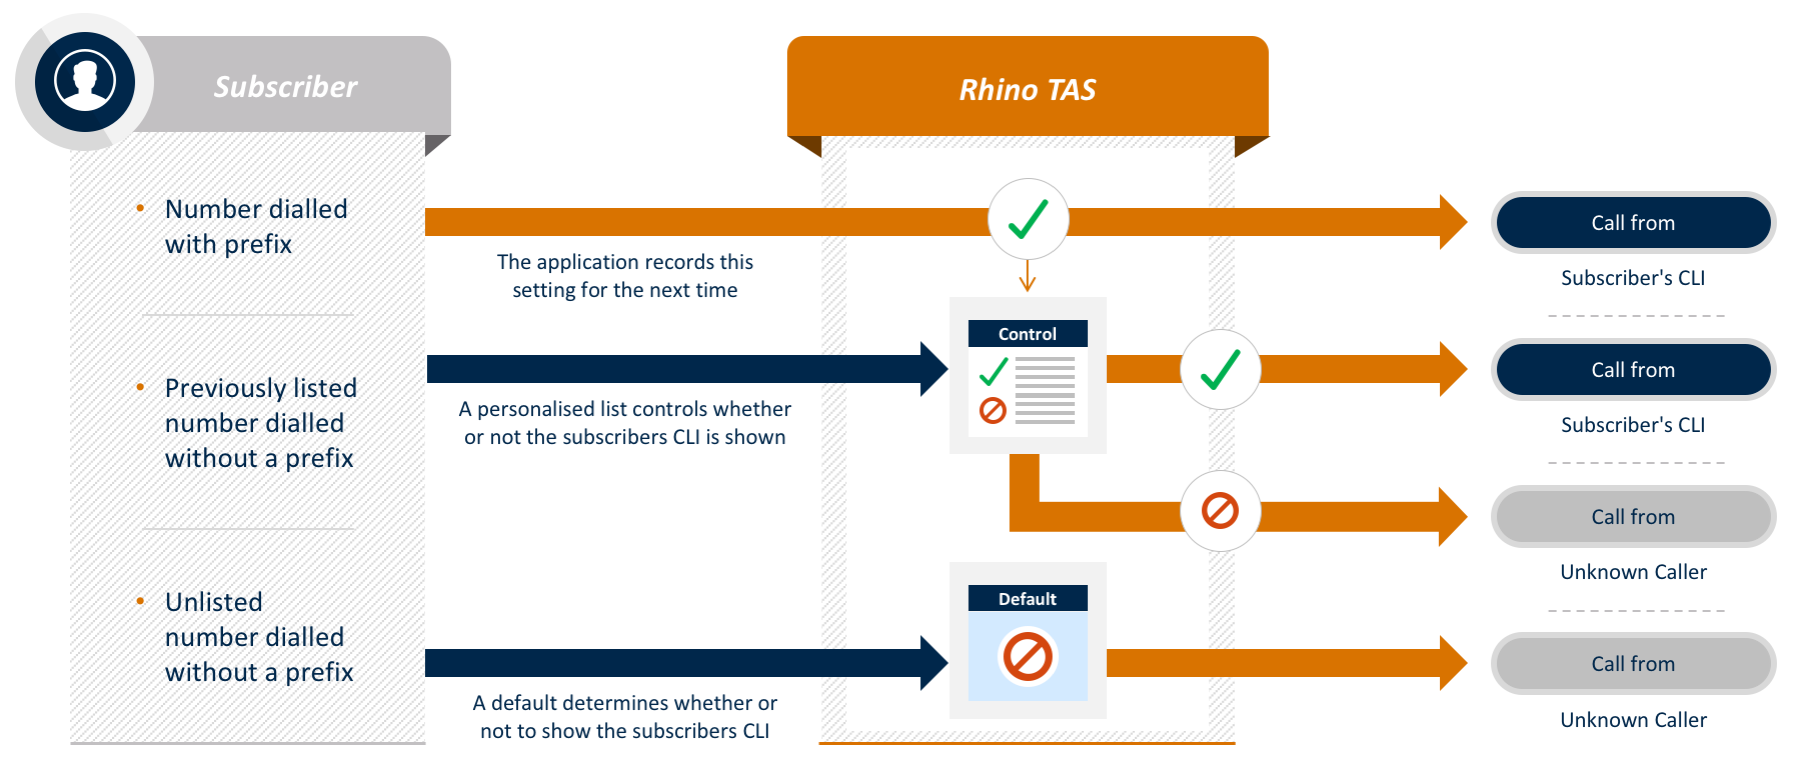 rhino-tas-app-call-identity-control